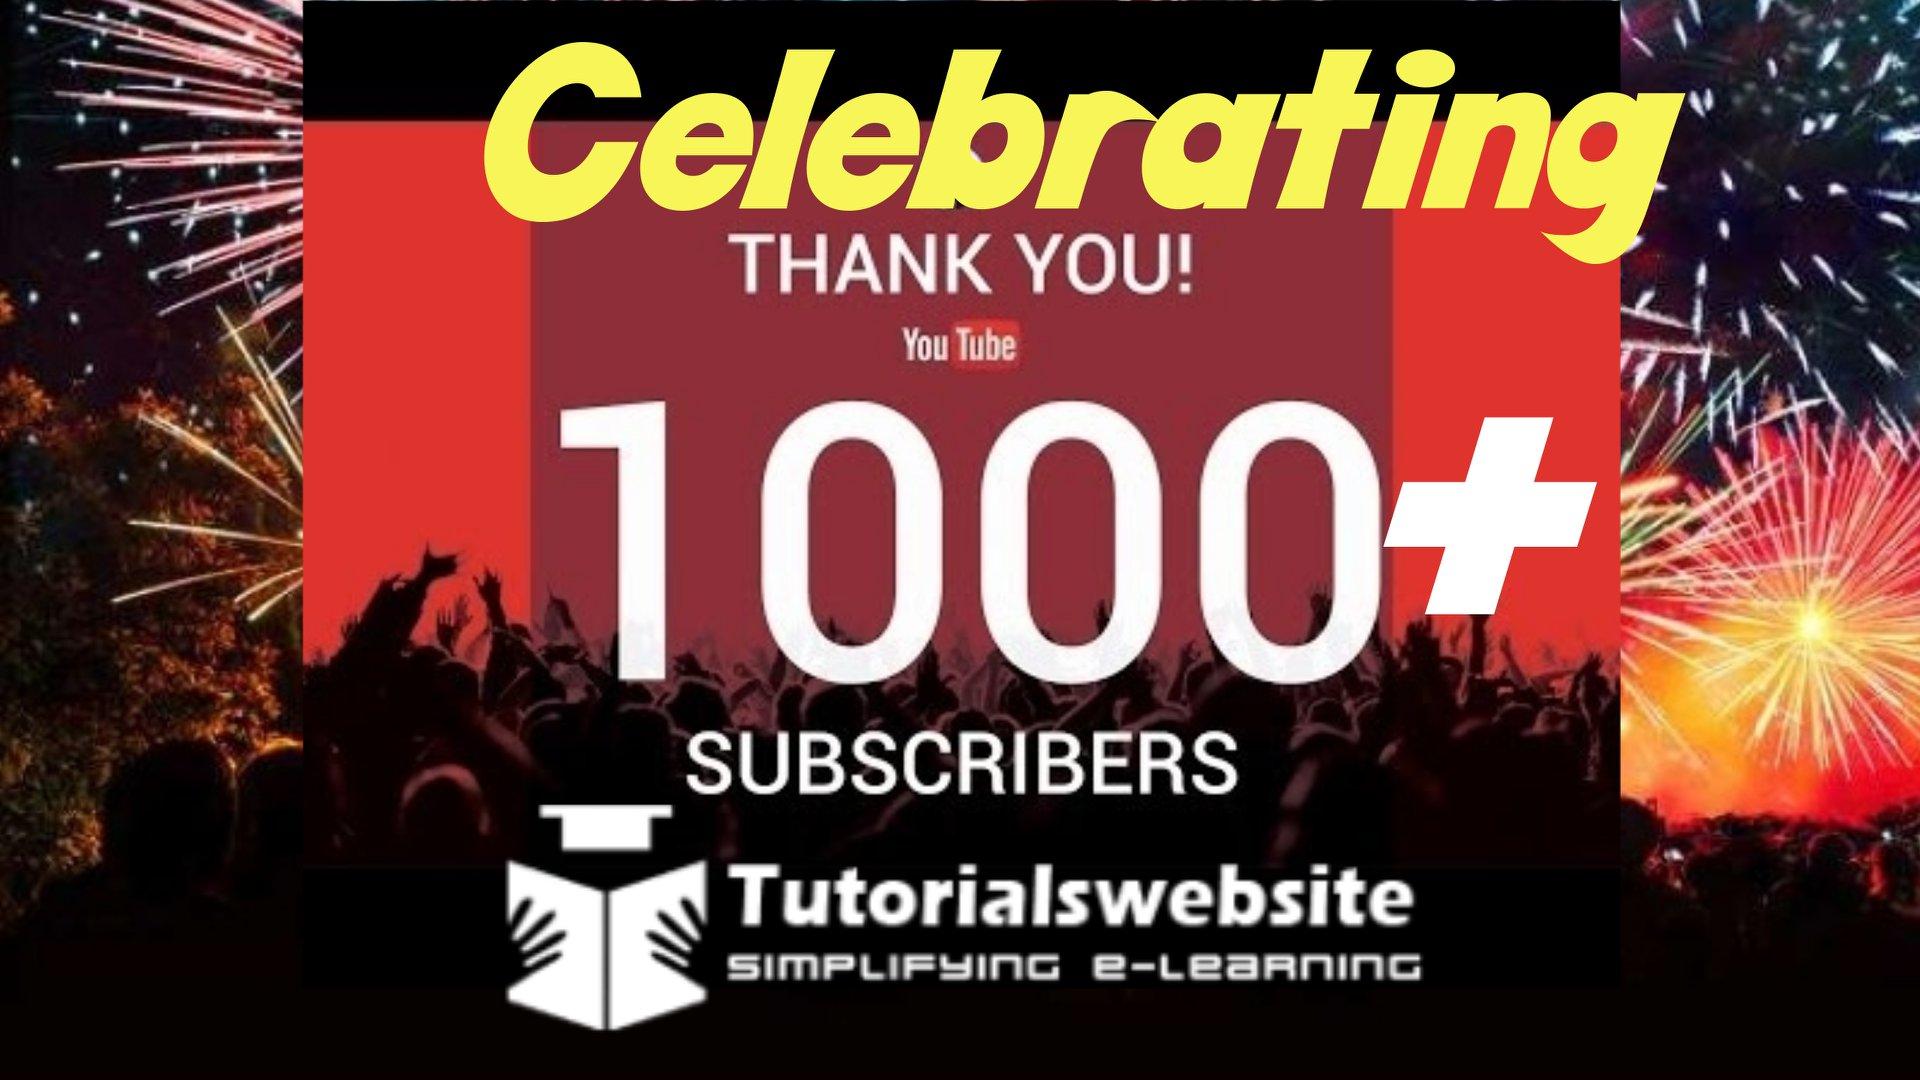 Tutorials website celebrate 1000 subscriber on youtube